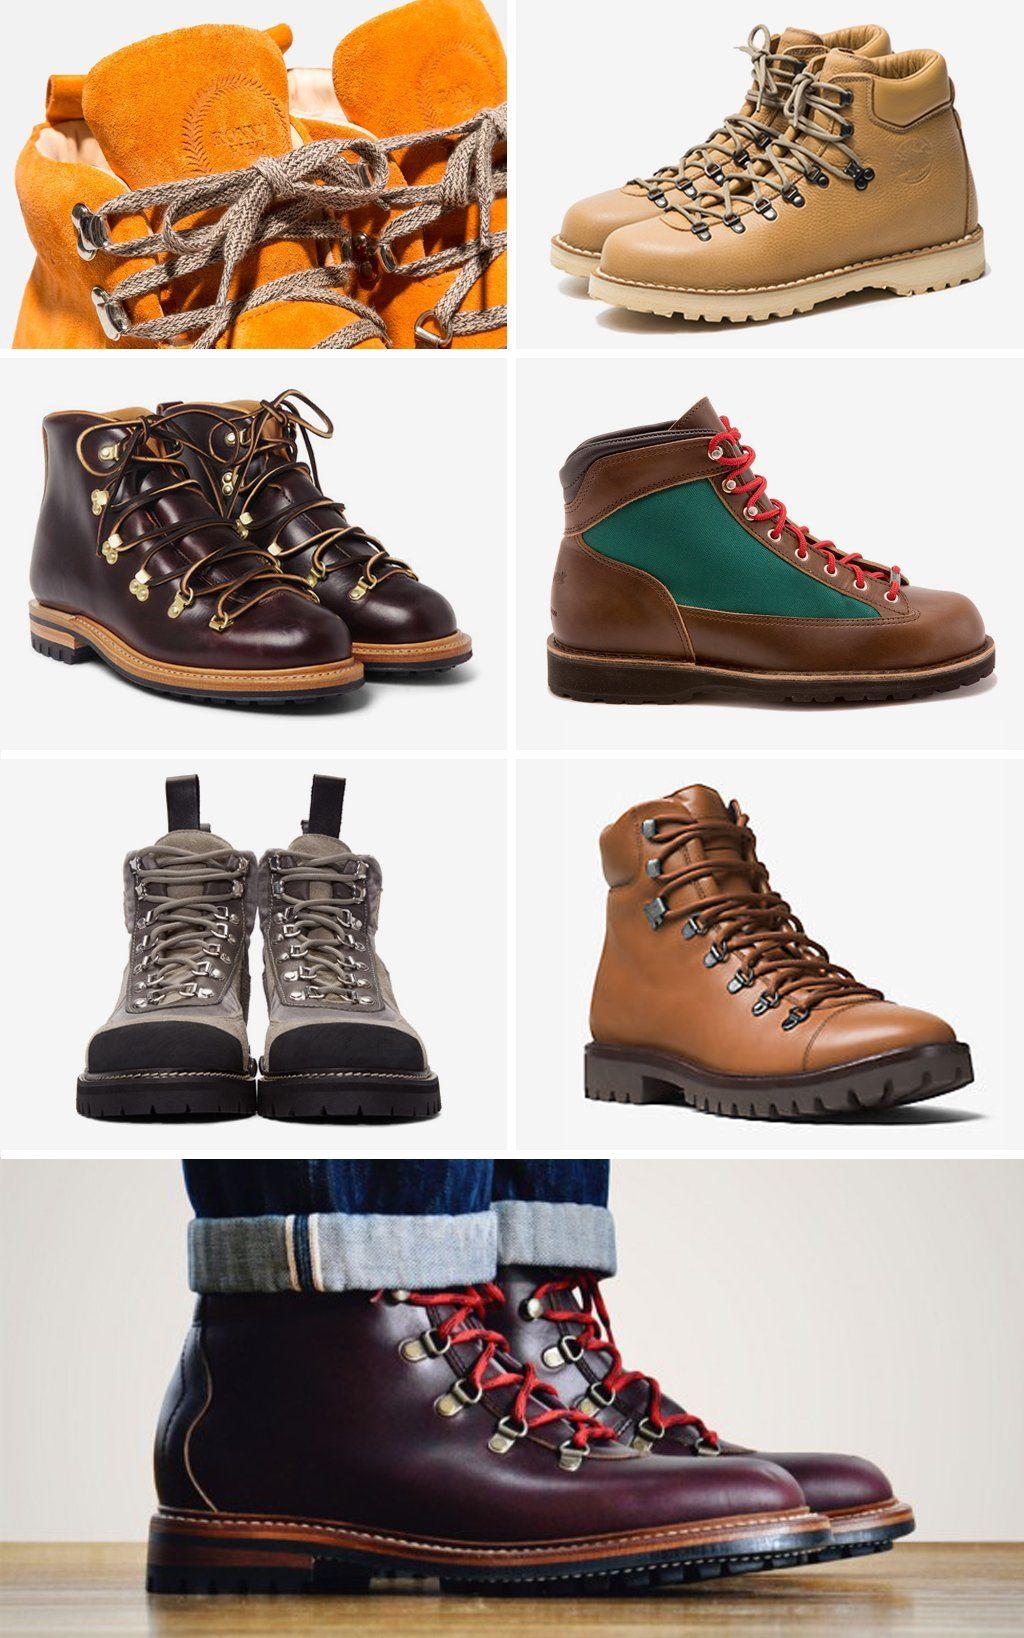 05c50042835 Seven Stylish Hiking Boots | InsideHook | GOOD ideas | Hiking boots ...